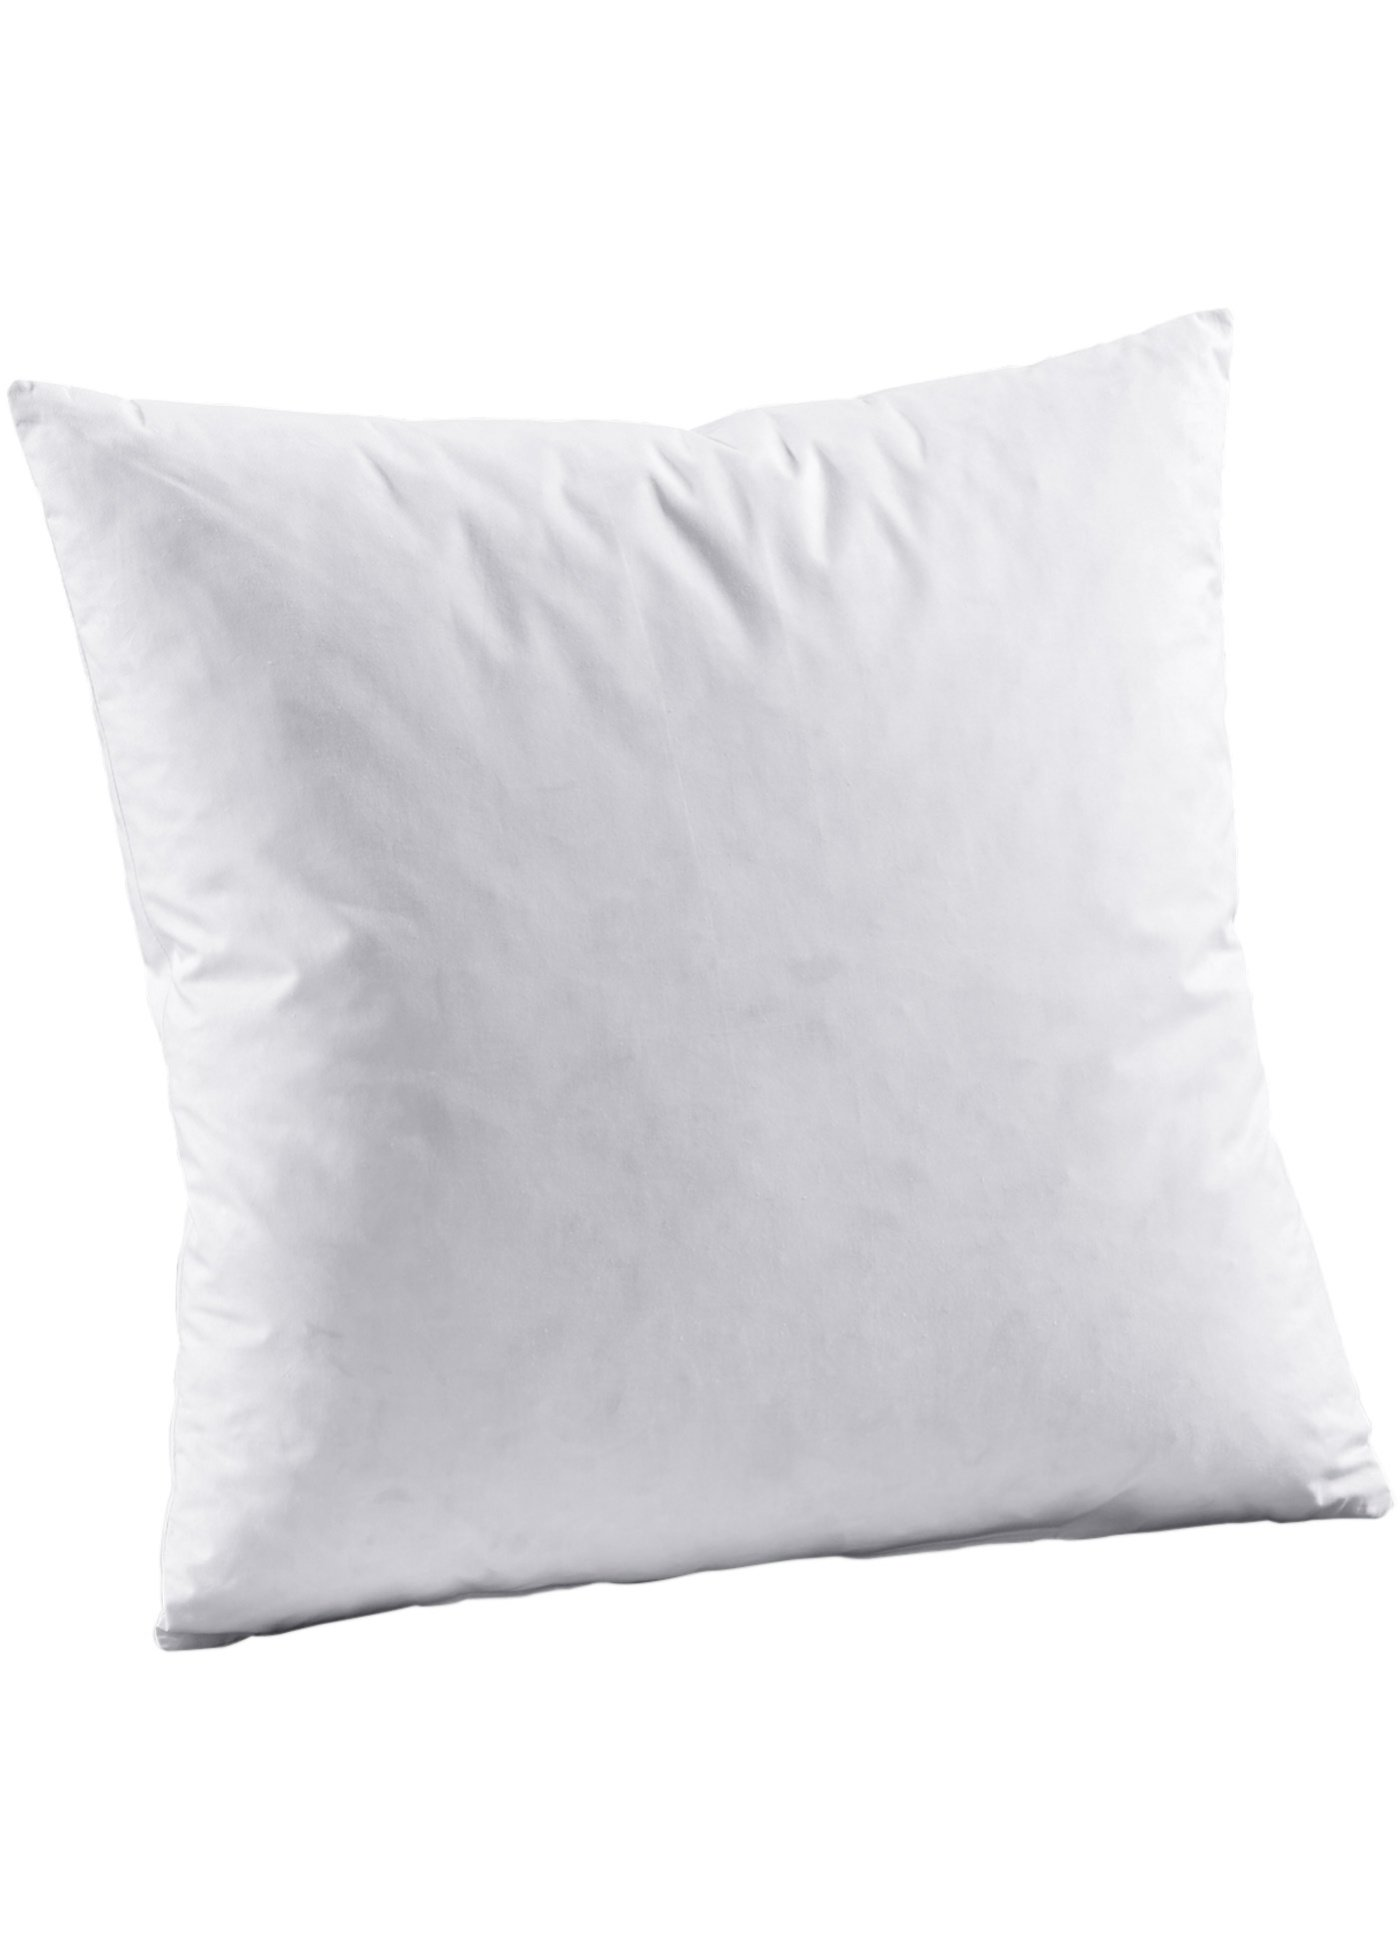 Подушка Базовая цвет: белый